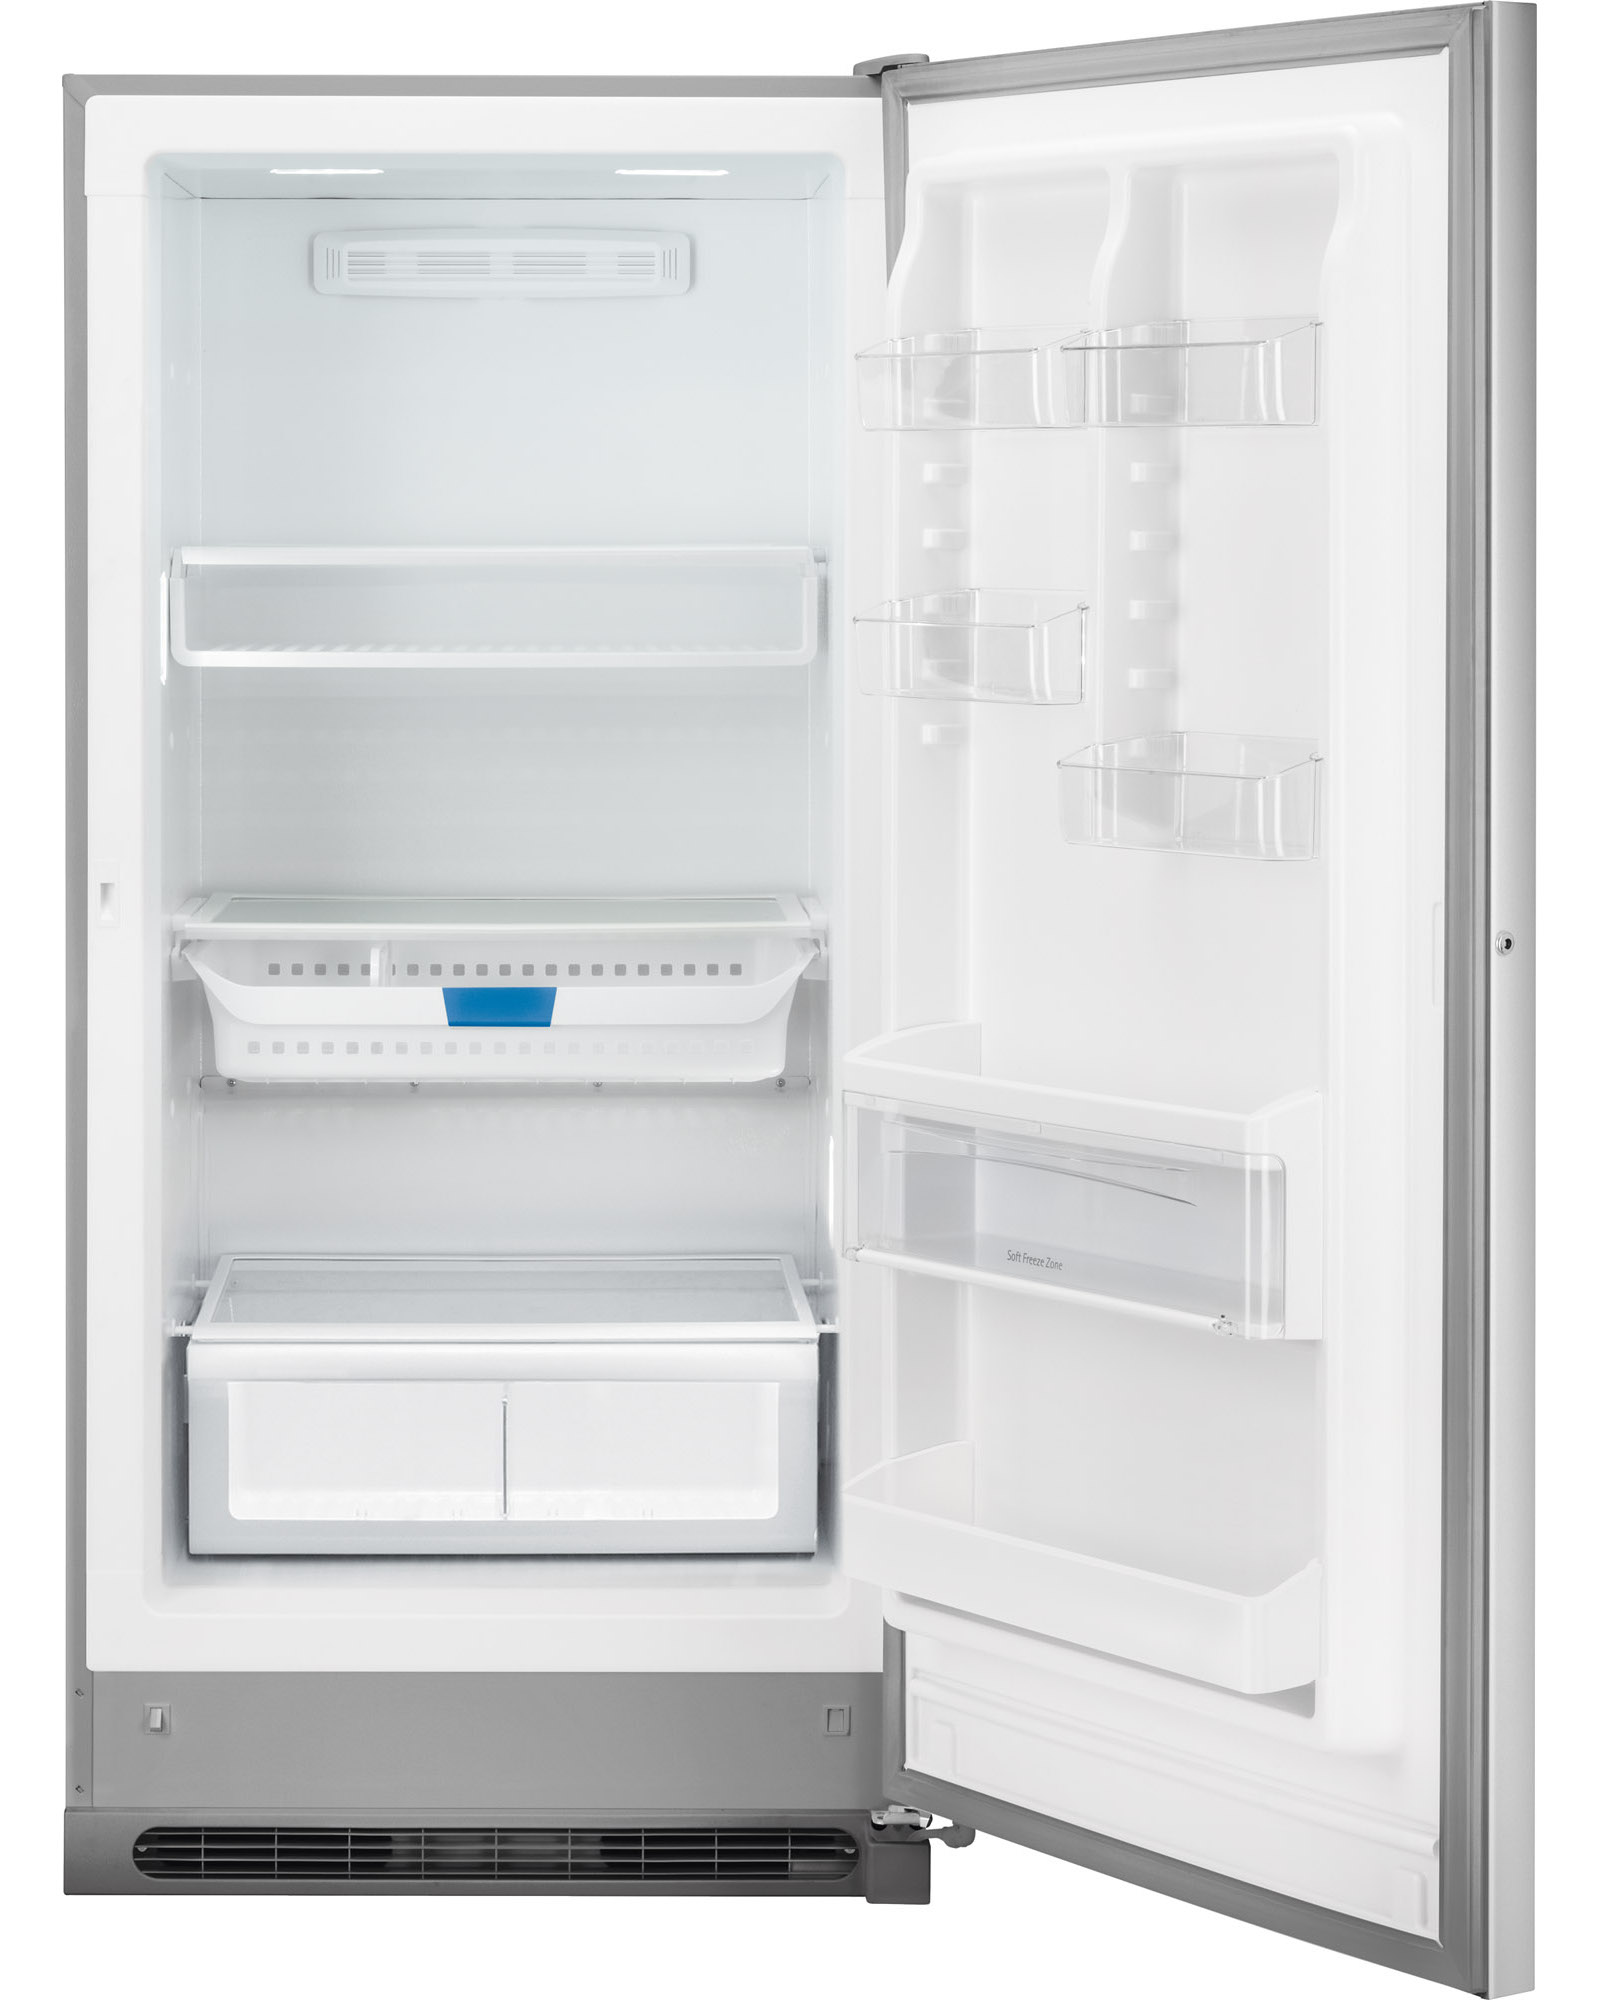 Frigidaire FGVU17F8QF 16.9 cu. ft. Convertible Refrigerator/Freezer - Stainless Steel